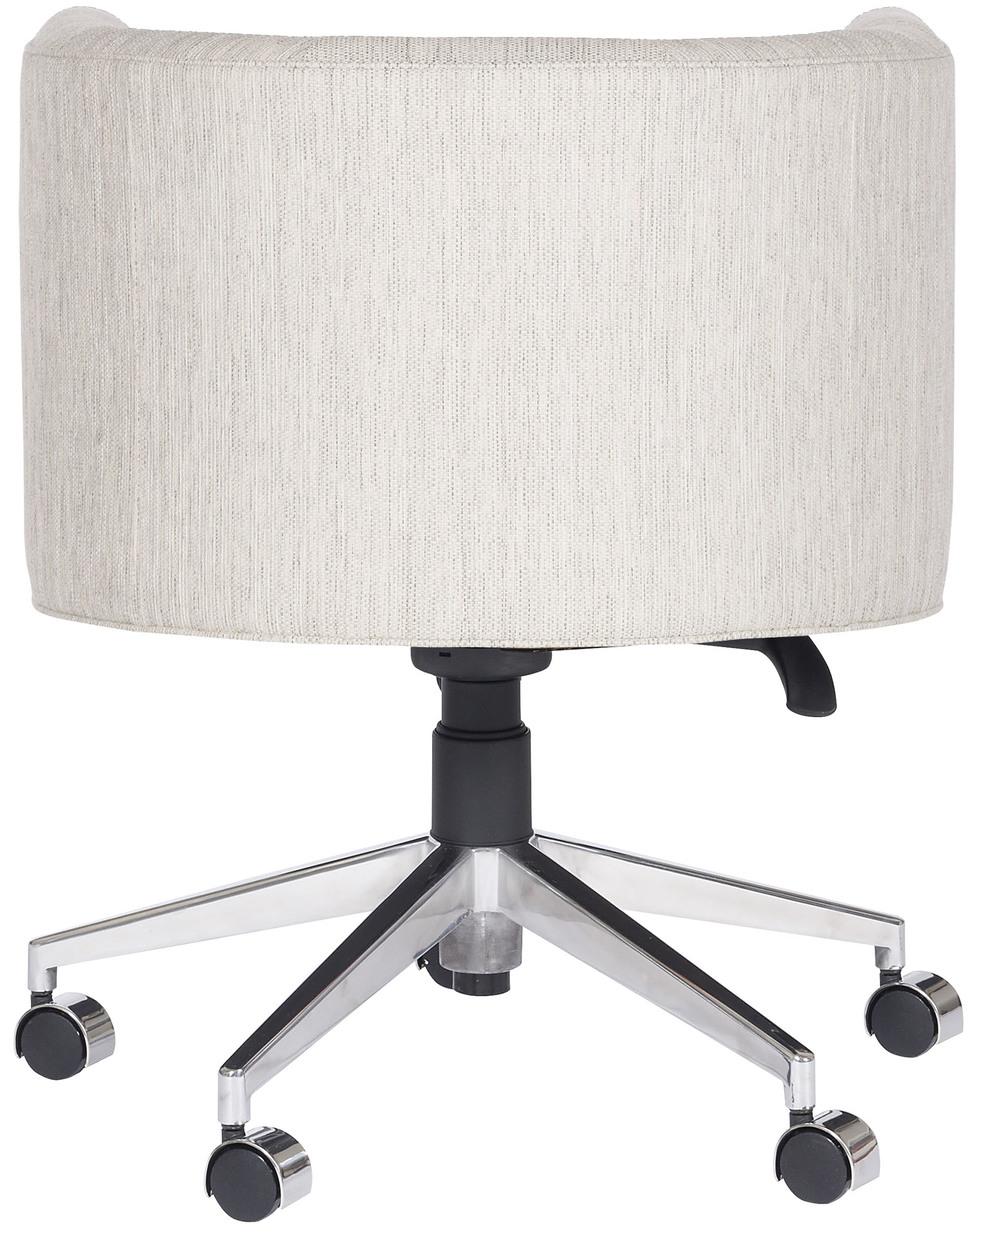 Vanguard Furniture - Desk Chair